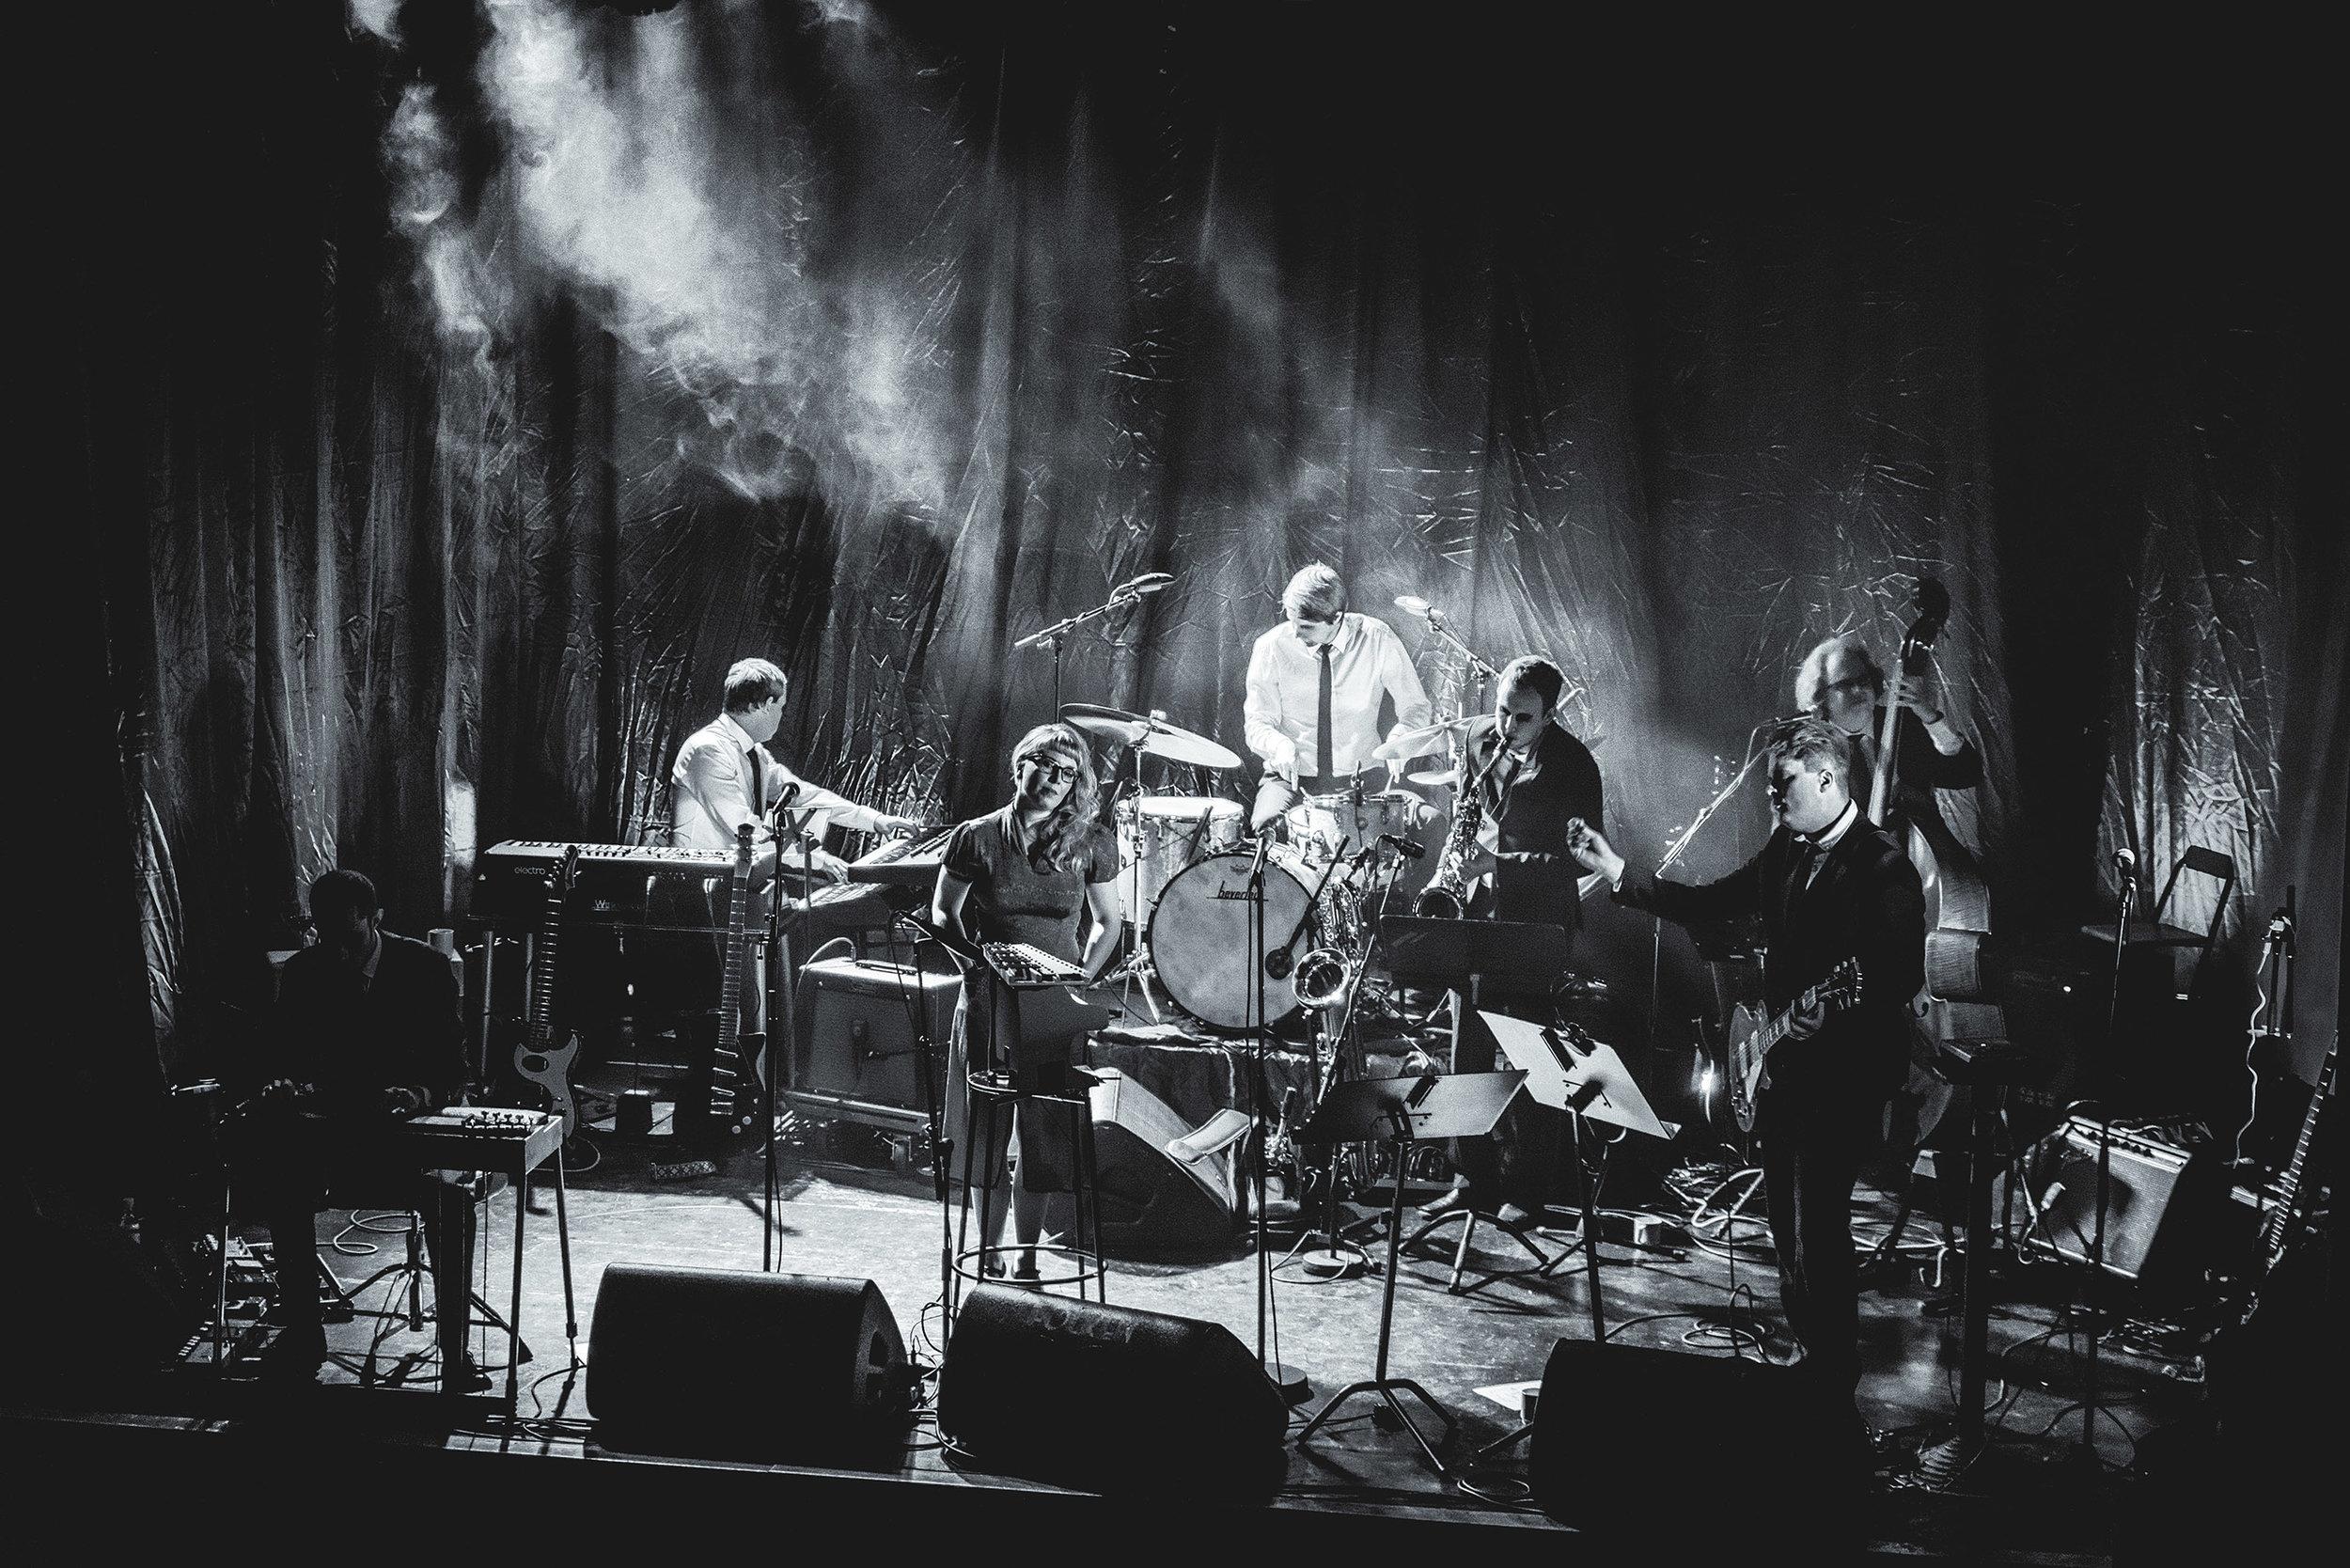 gallery-band_norwegians.jpg